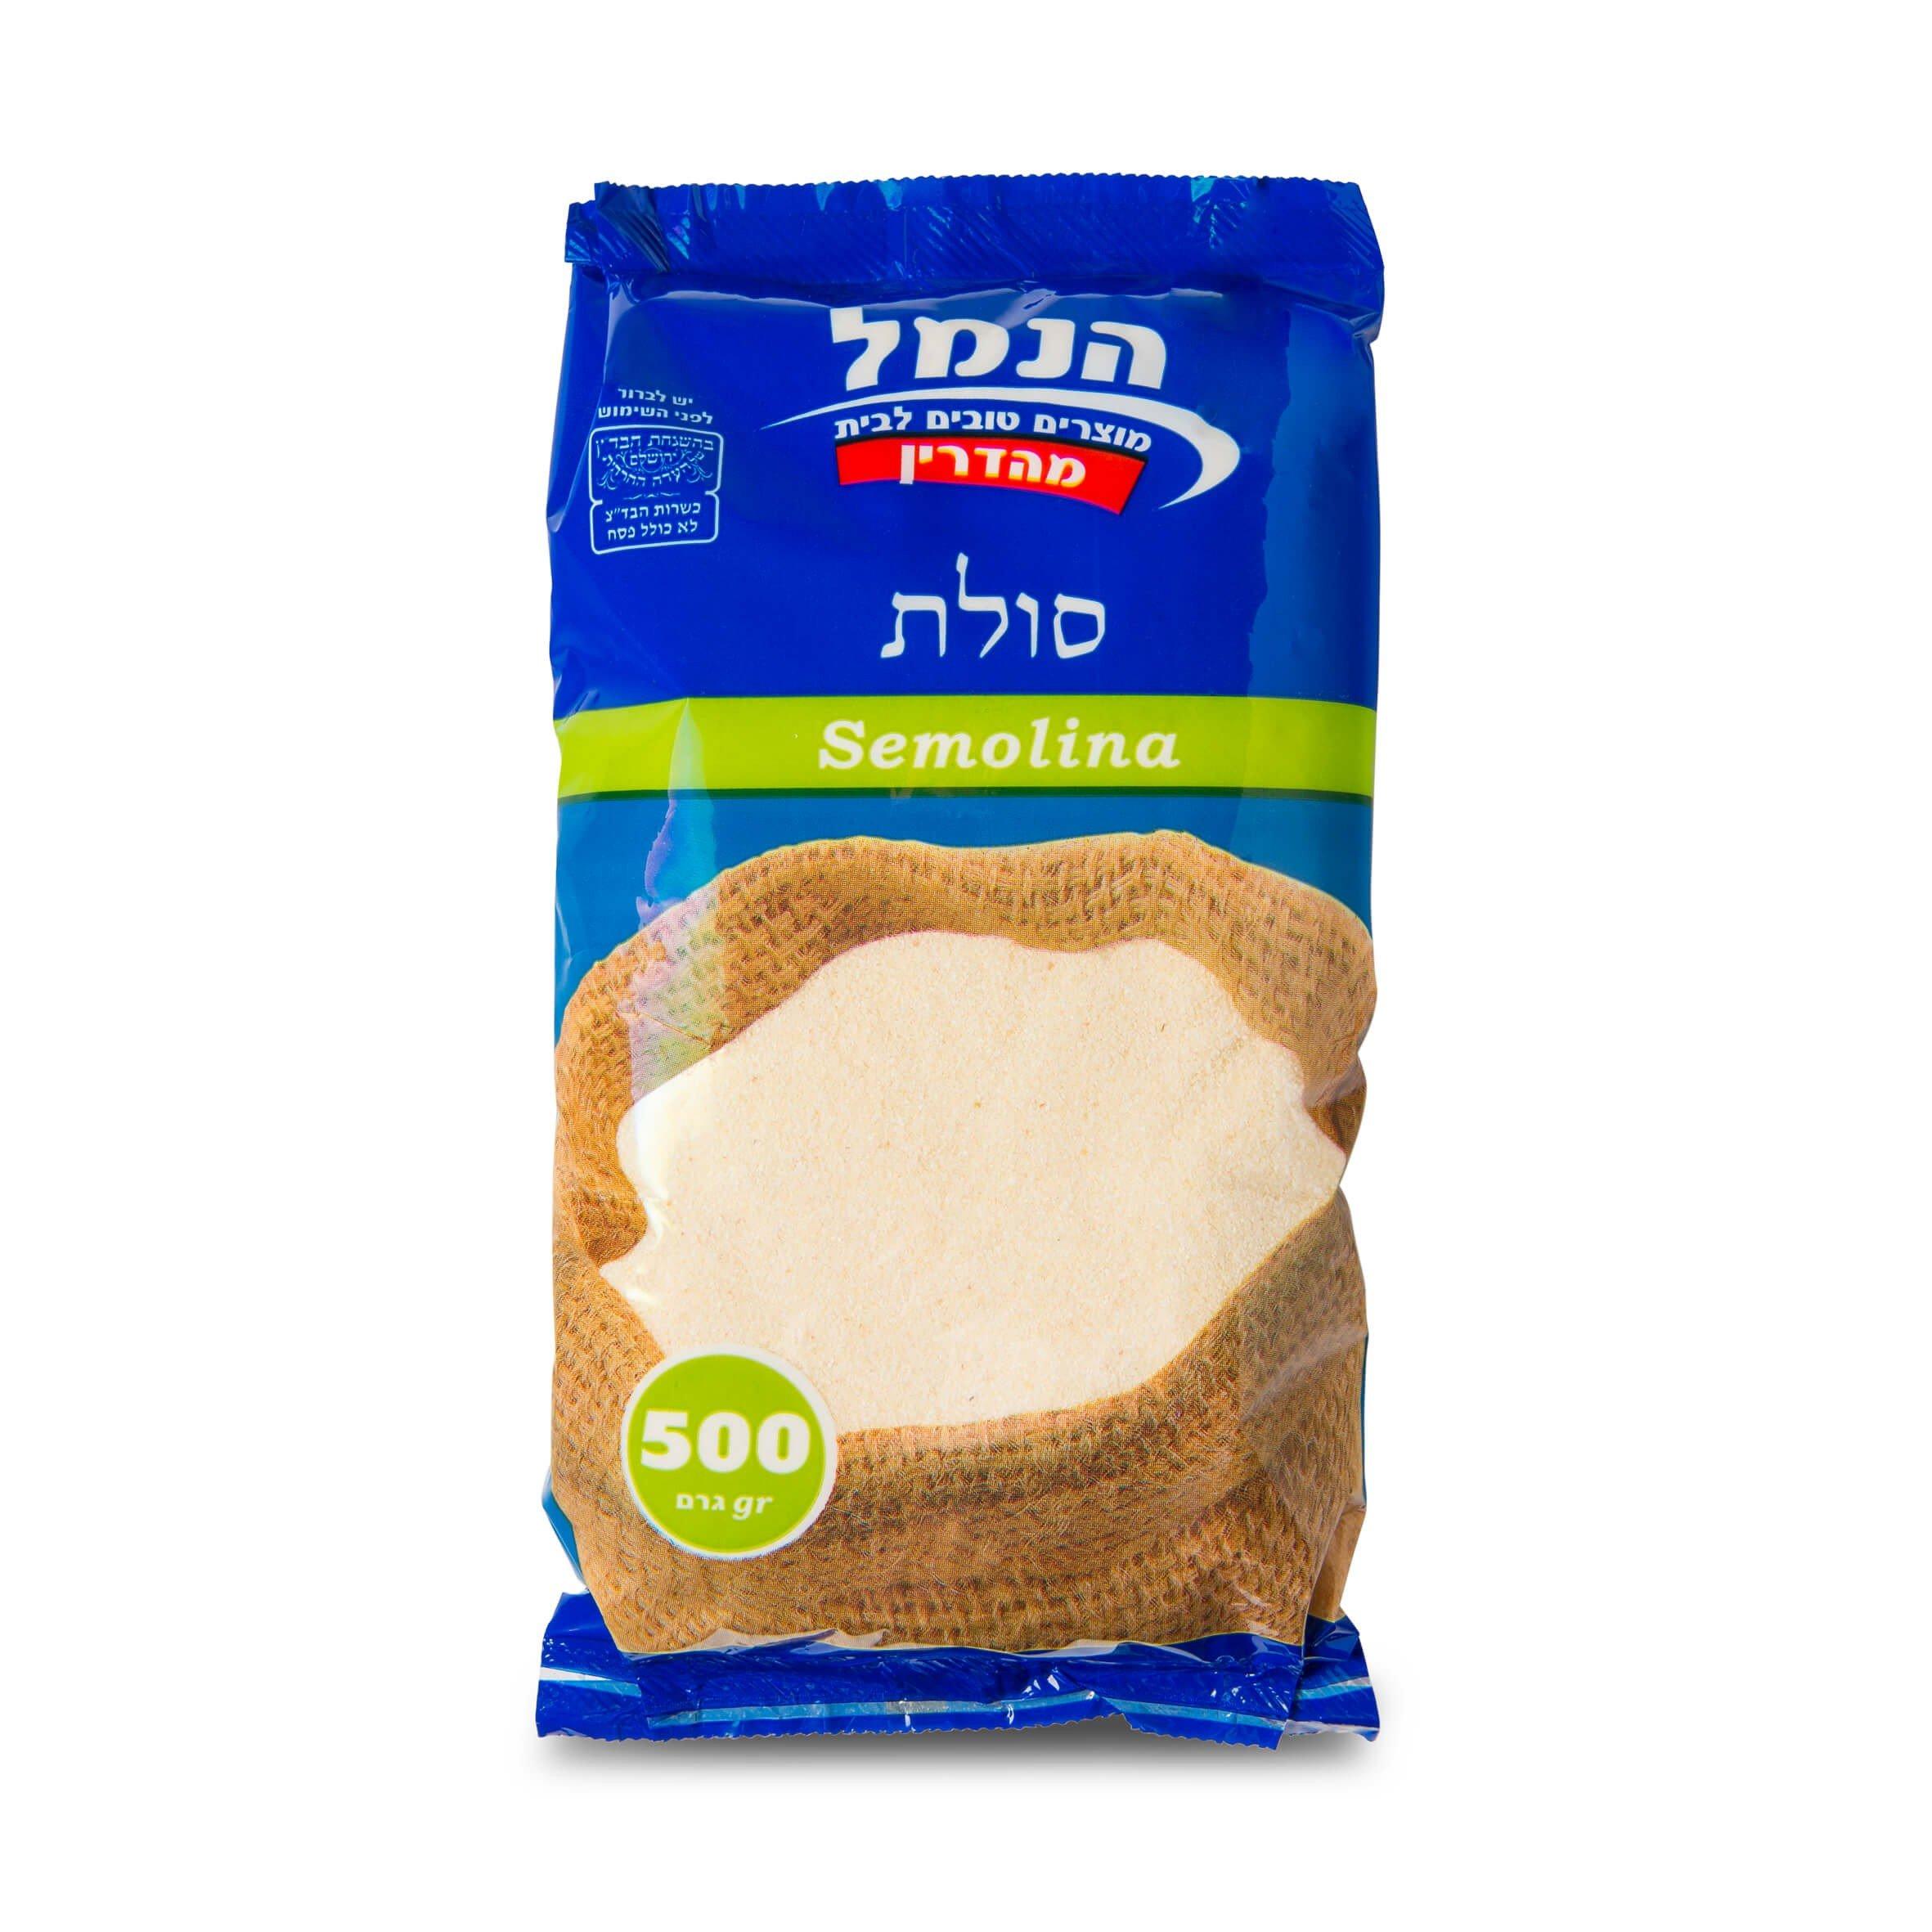 Hanamal Semolina Gluten Free 16.5 Oz. Pack Of 3.